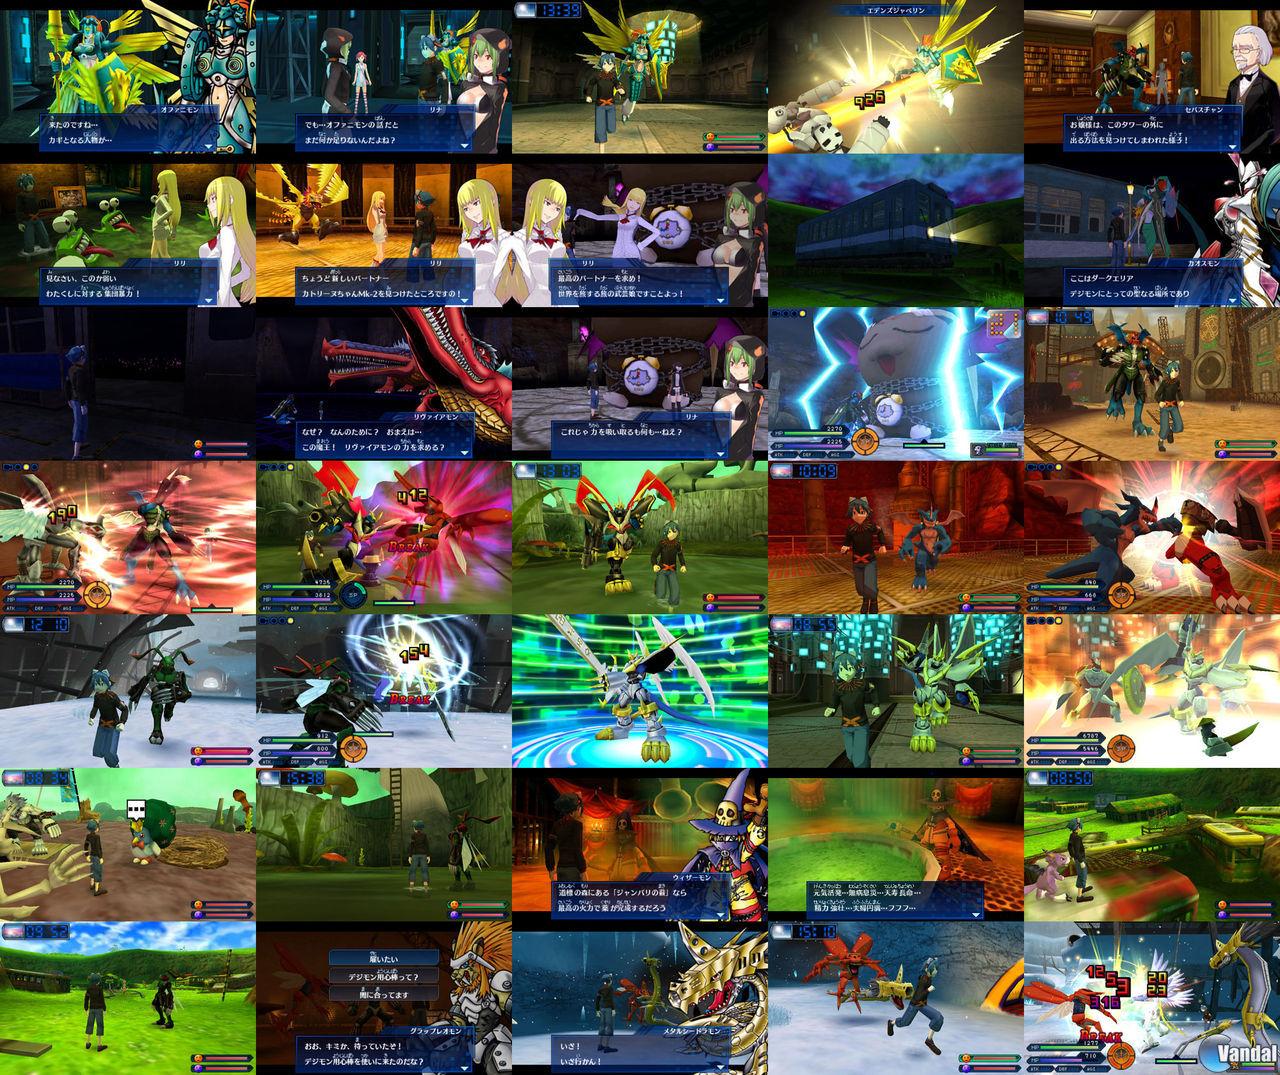 Anunciado Digimon World Re: Digitize Decode Digimon-world-re-digitize-decode-201362519237_2